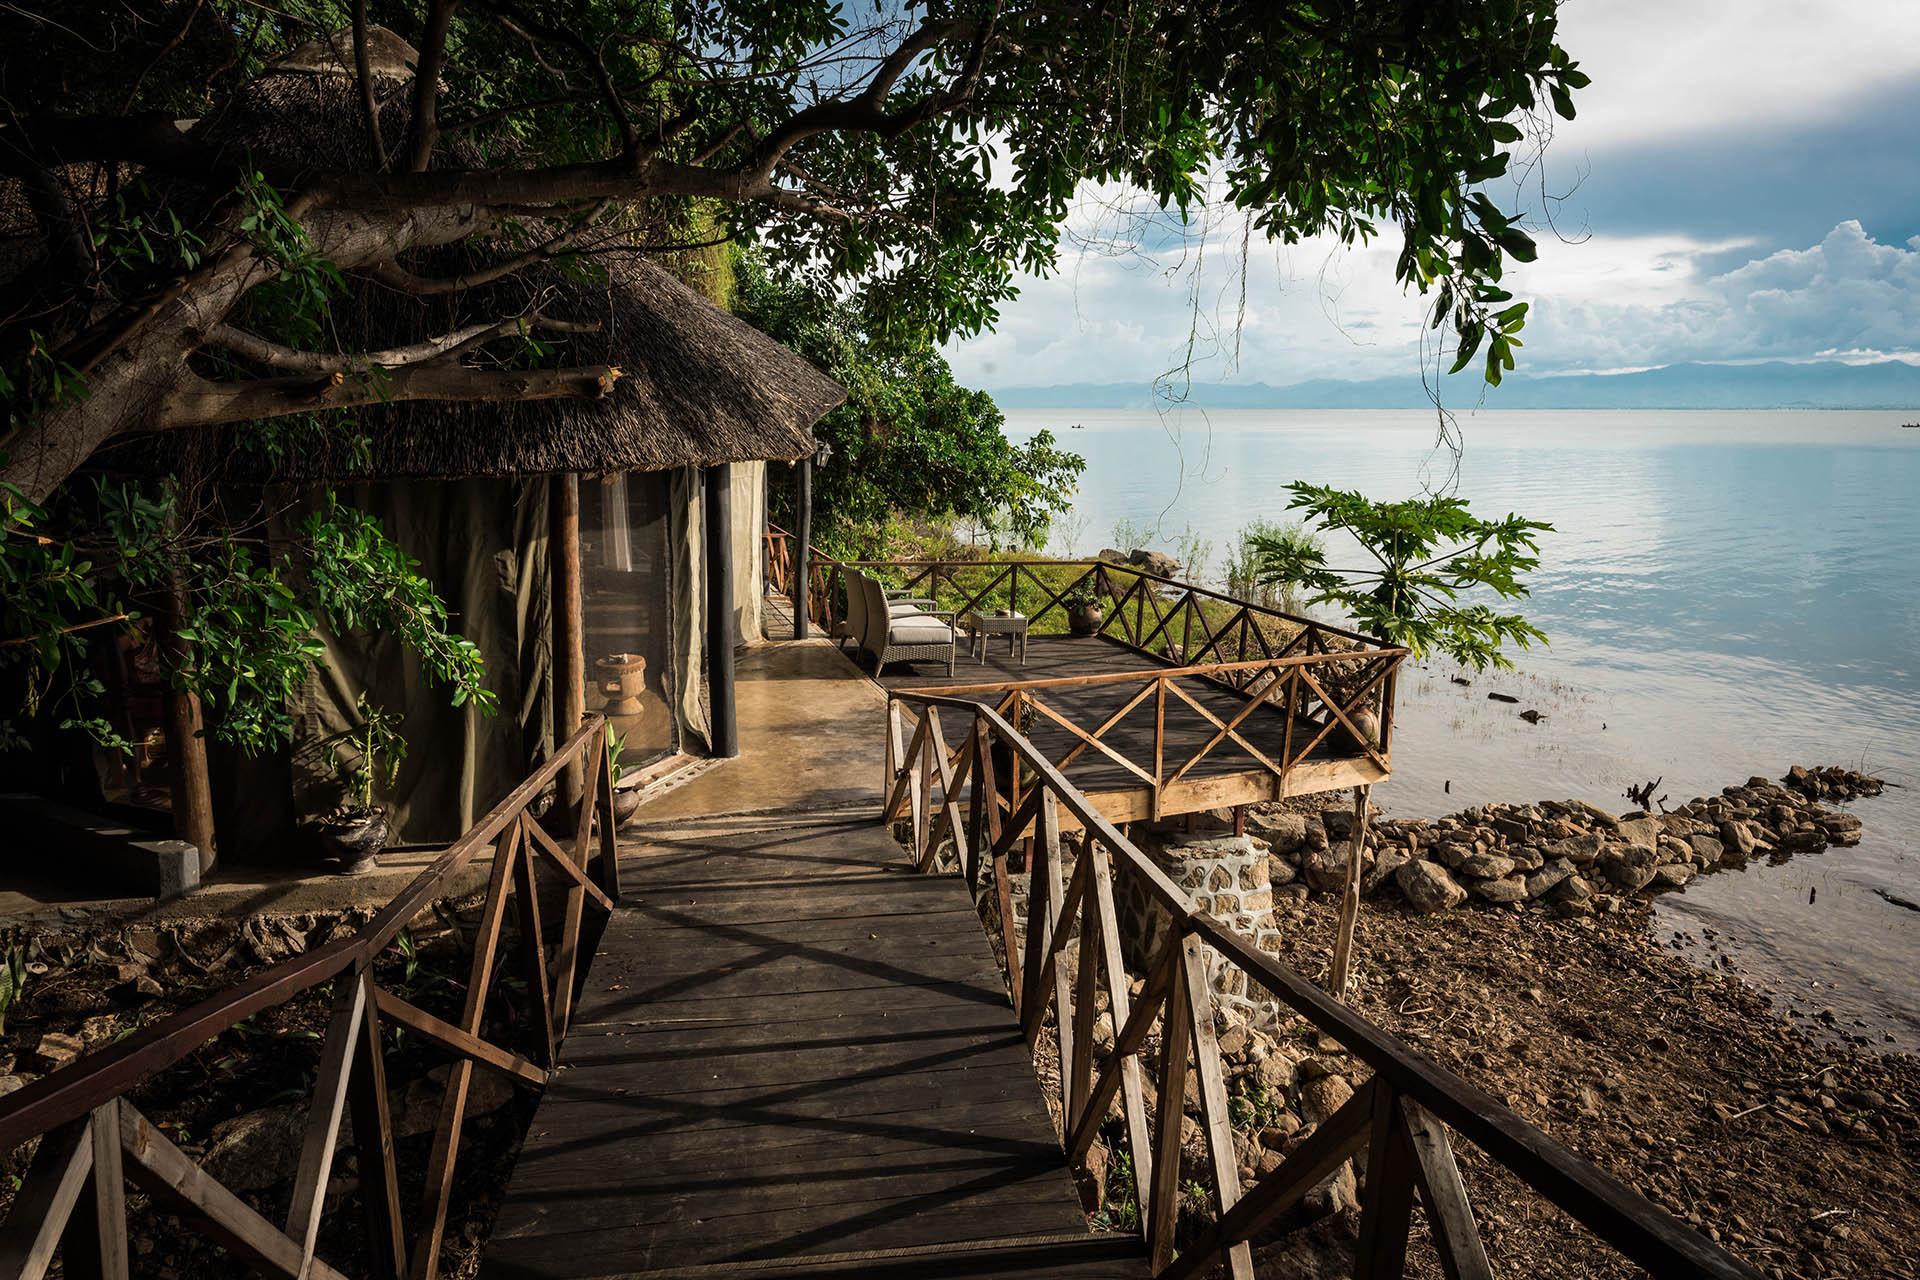 likoma island tours-malawi-points-of-interest-malawian-style-malawi-adventures-experiences-specialist-tour-operator-blue-zebra-chalet